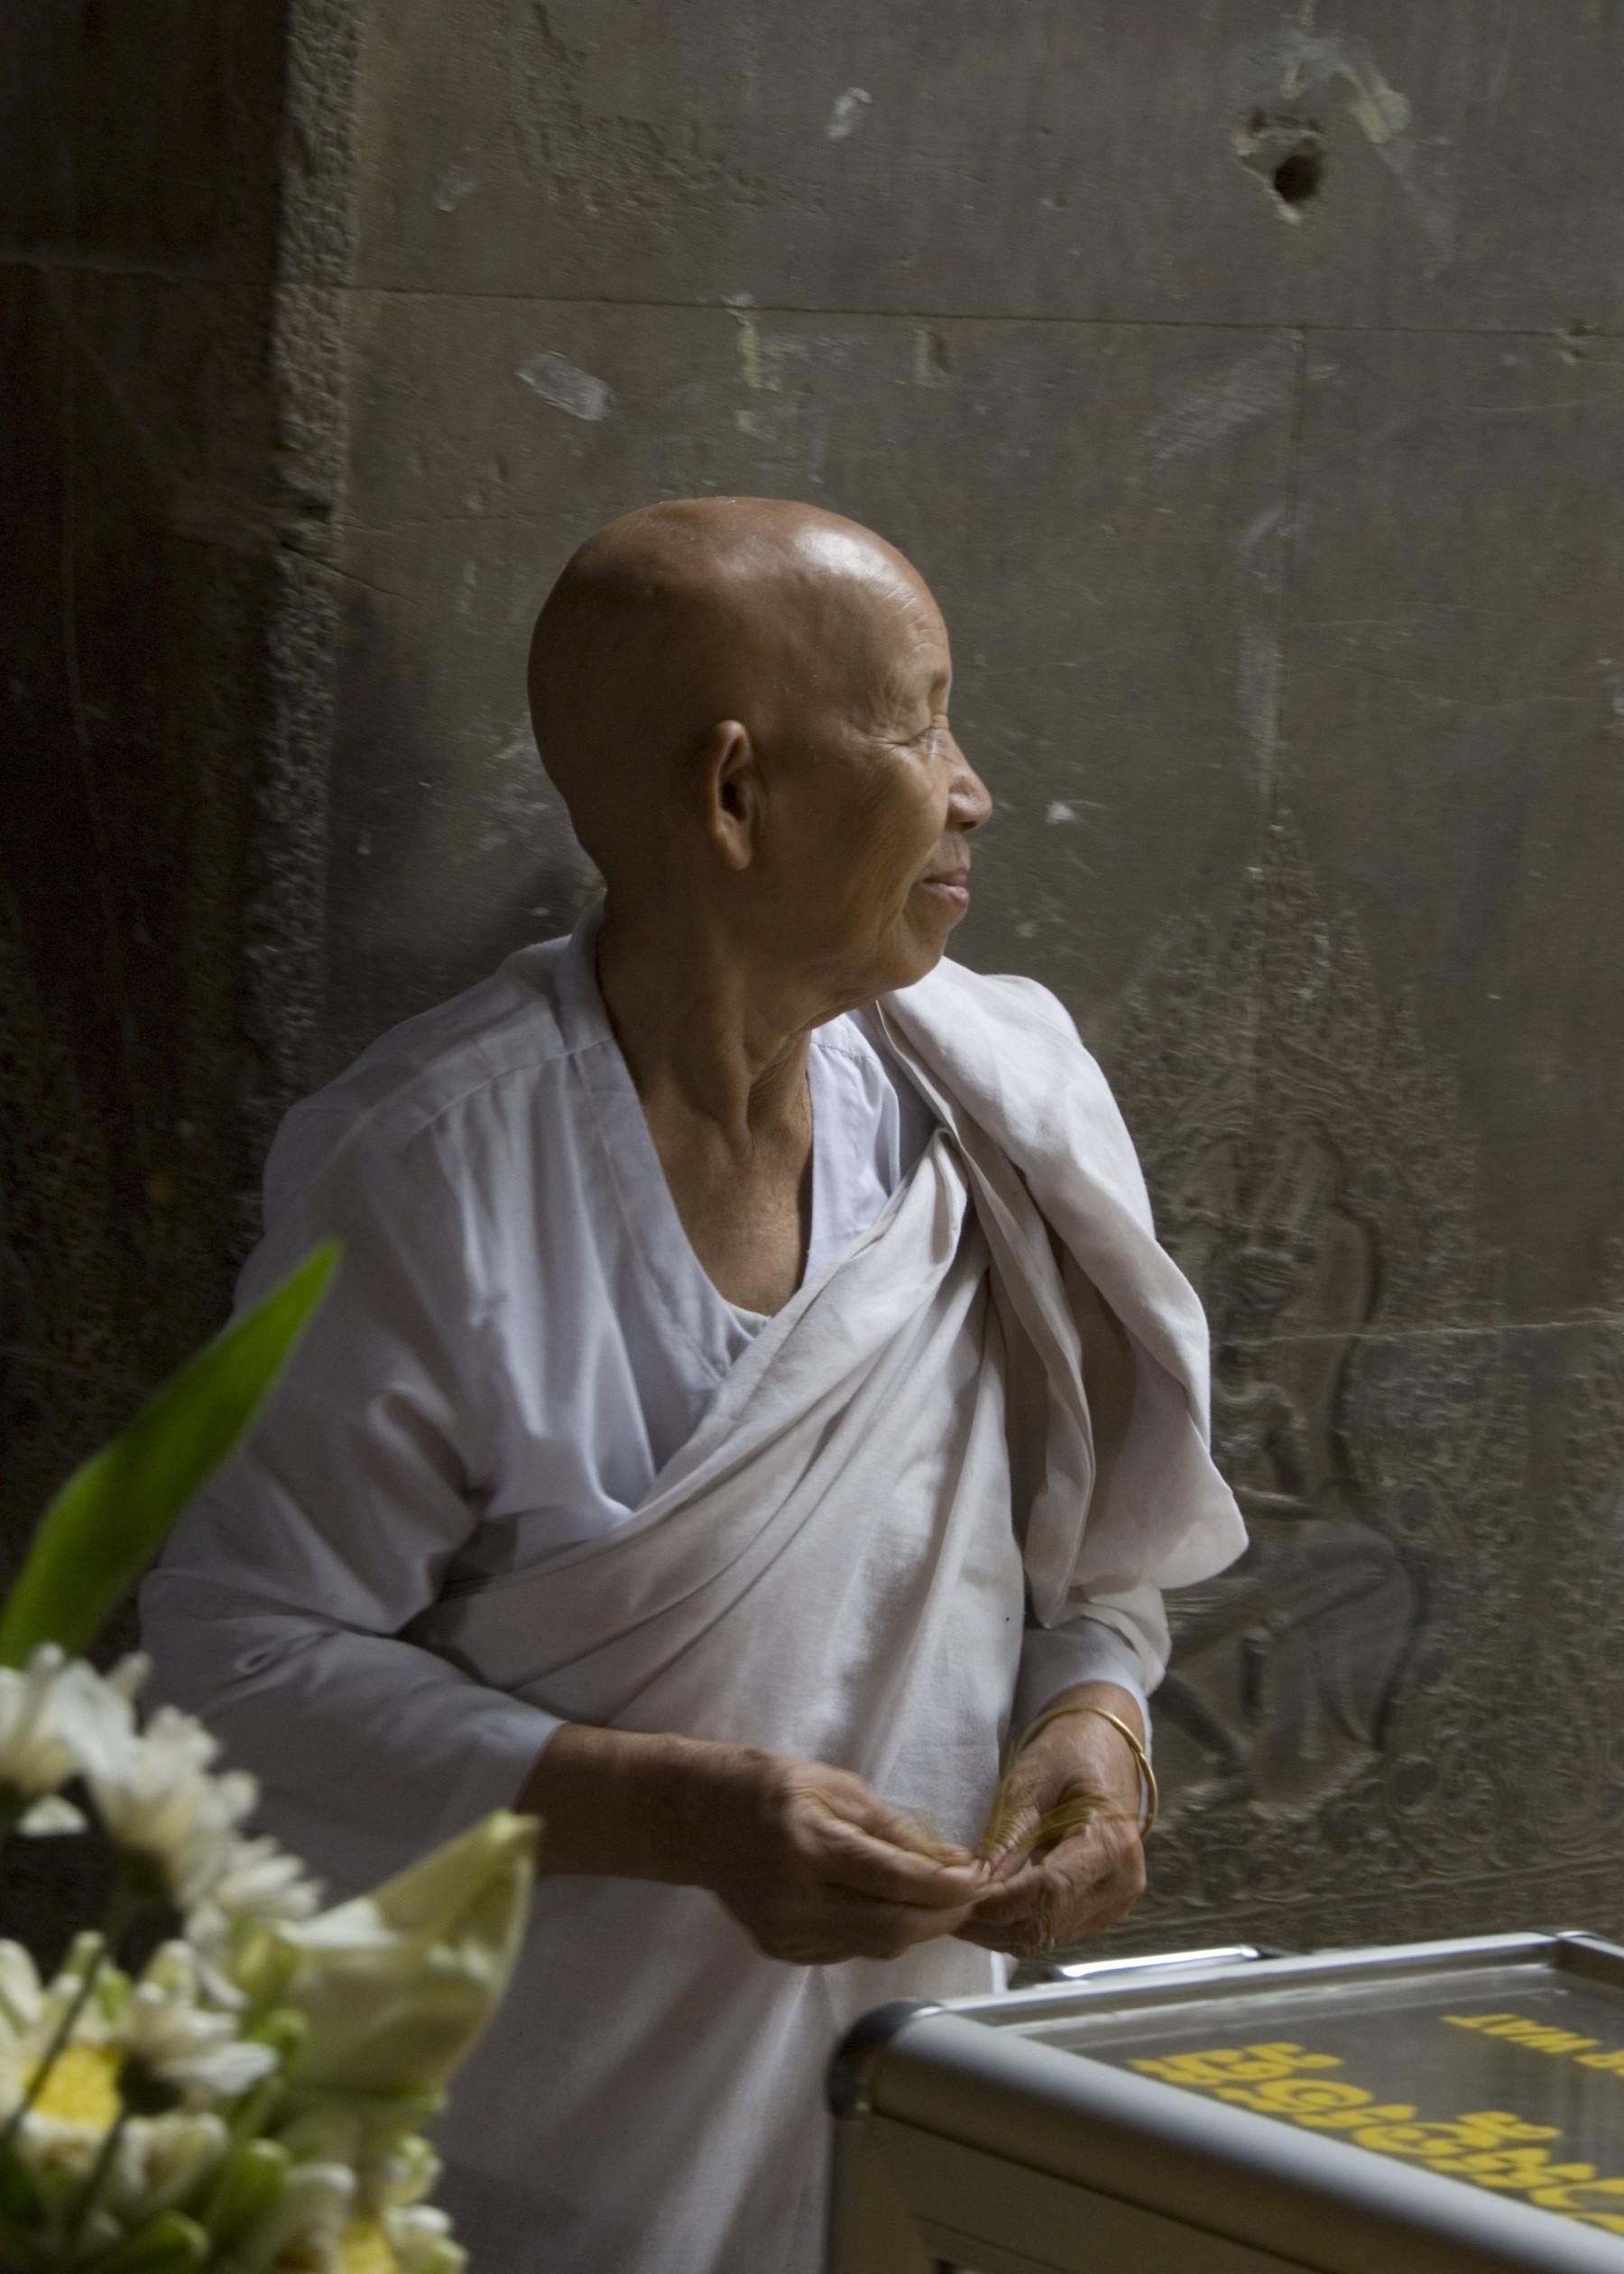 alice-wright-budista-monja-angkor-wat